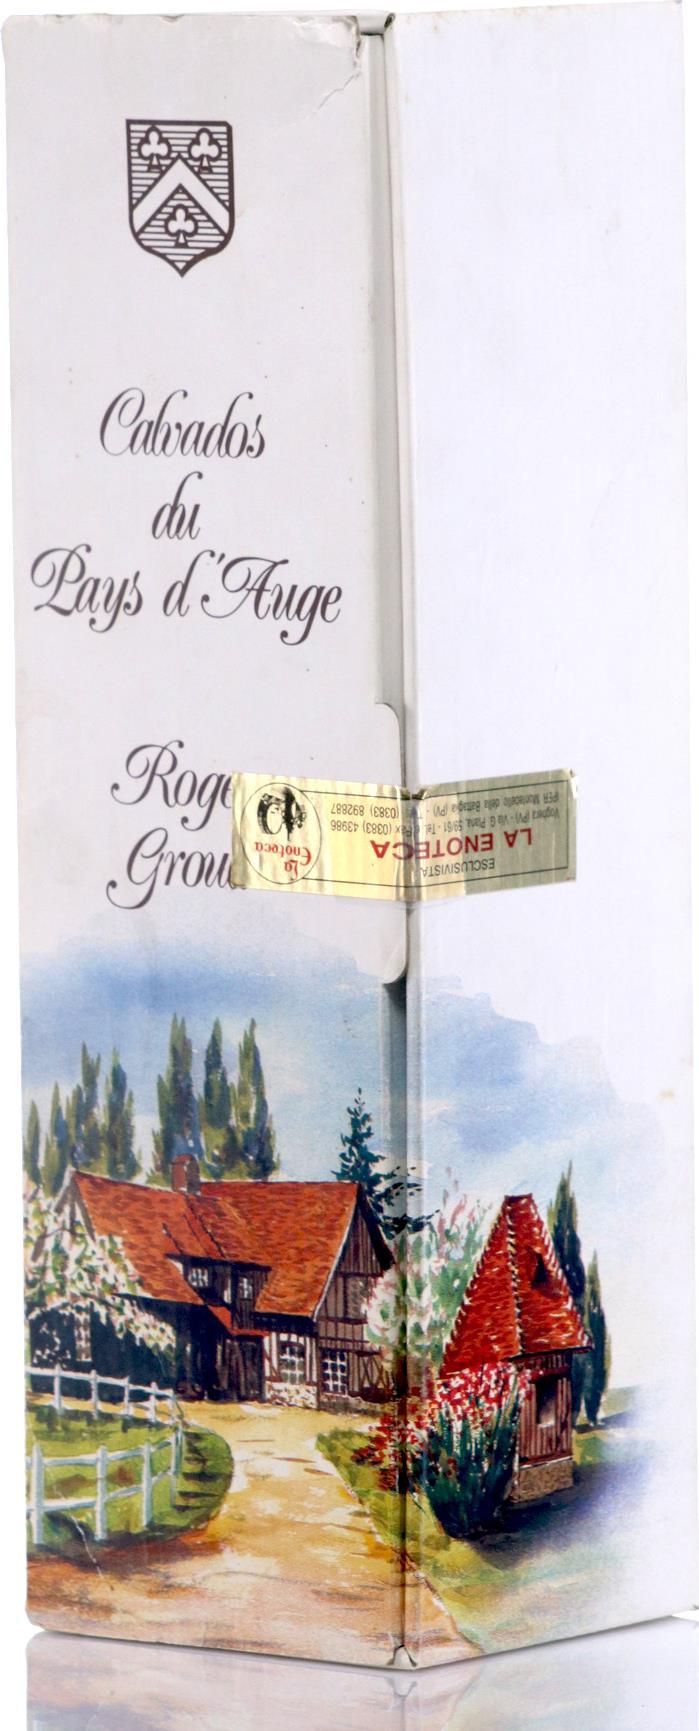 Calvados 1968 Roger Groult